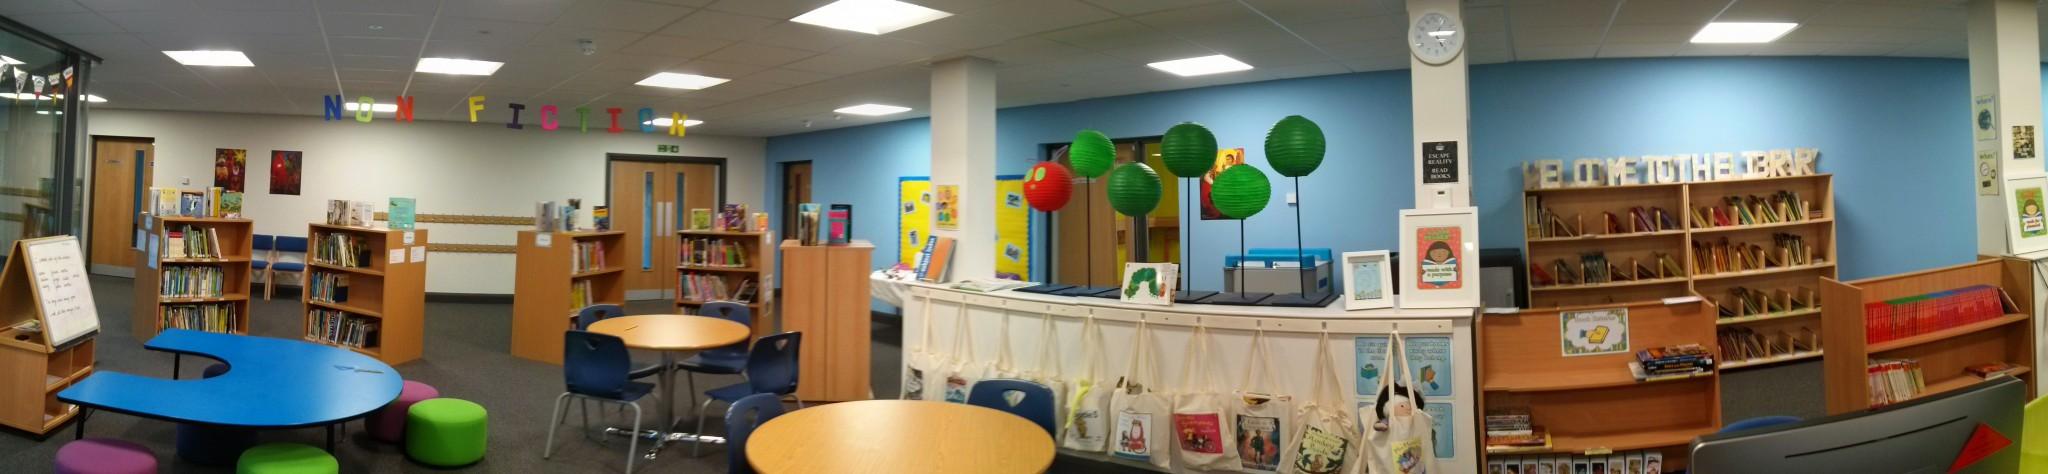 Photo of primary school library